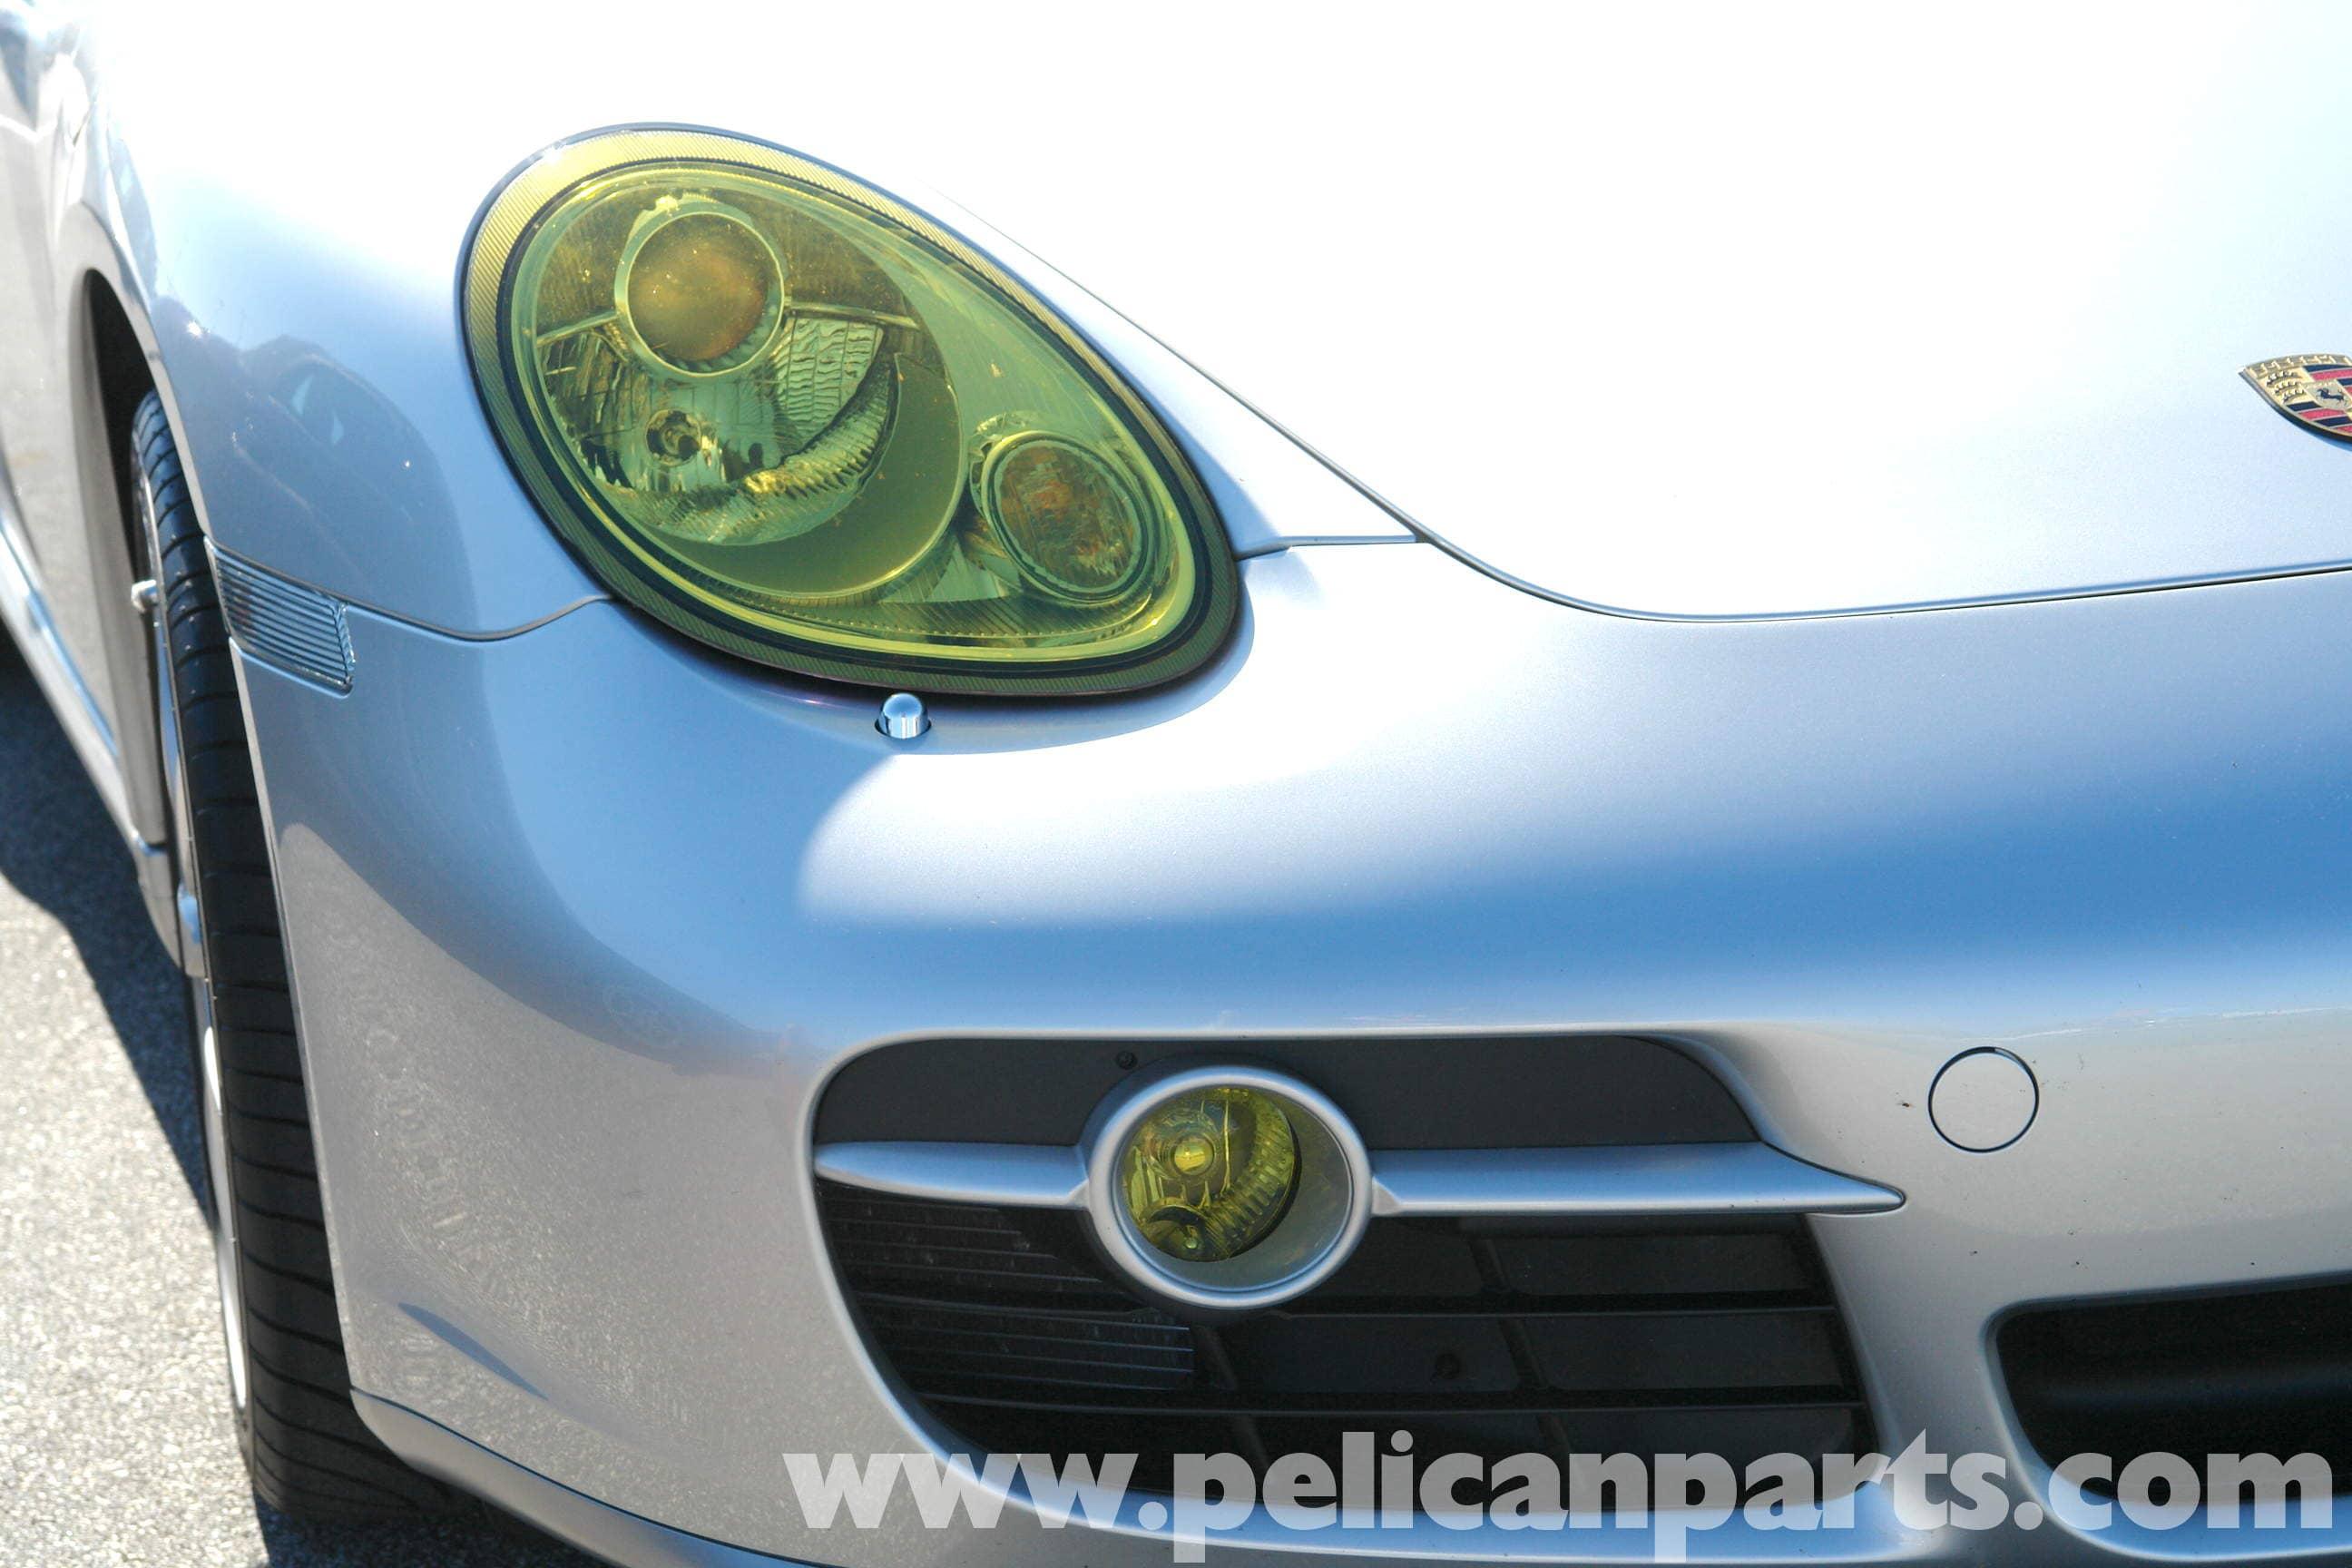 Porsche 911 Carrera Headlamp Protection Film Installation